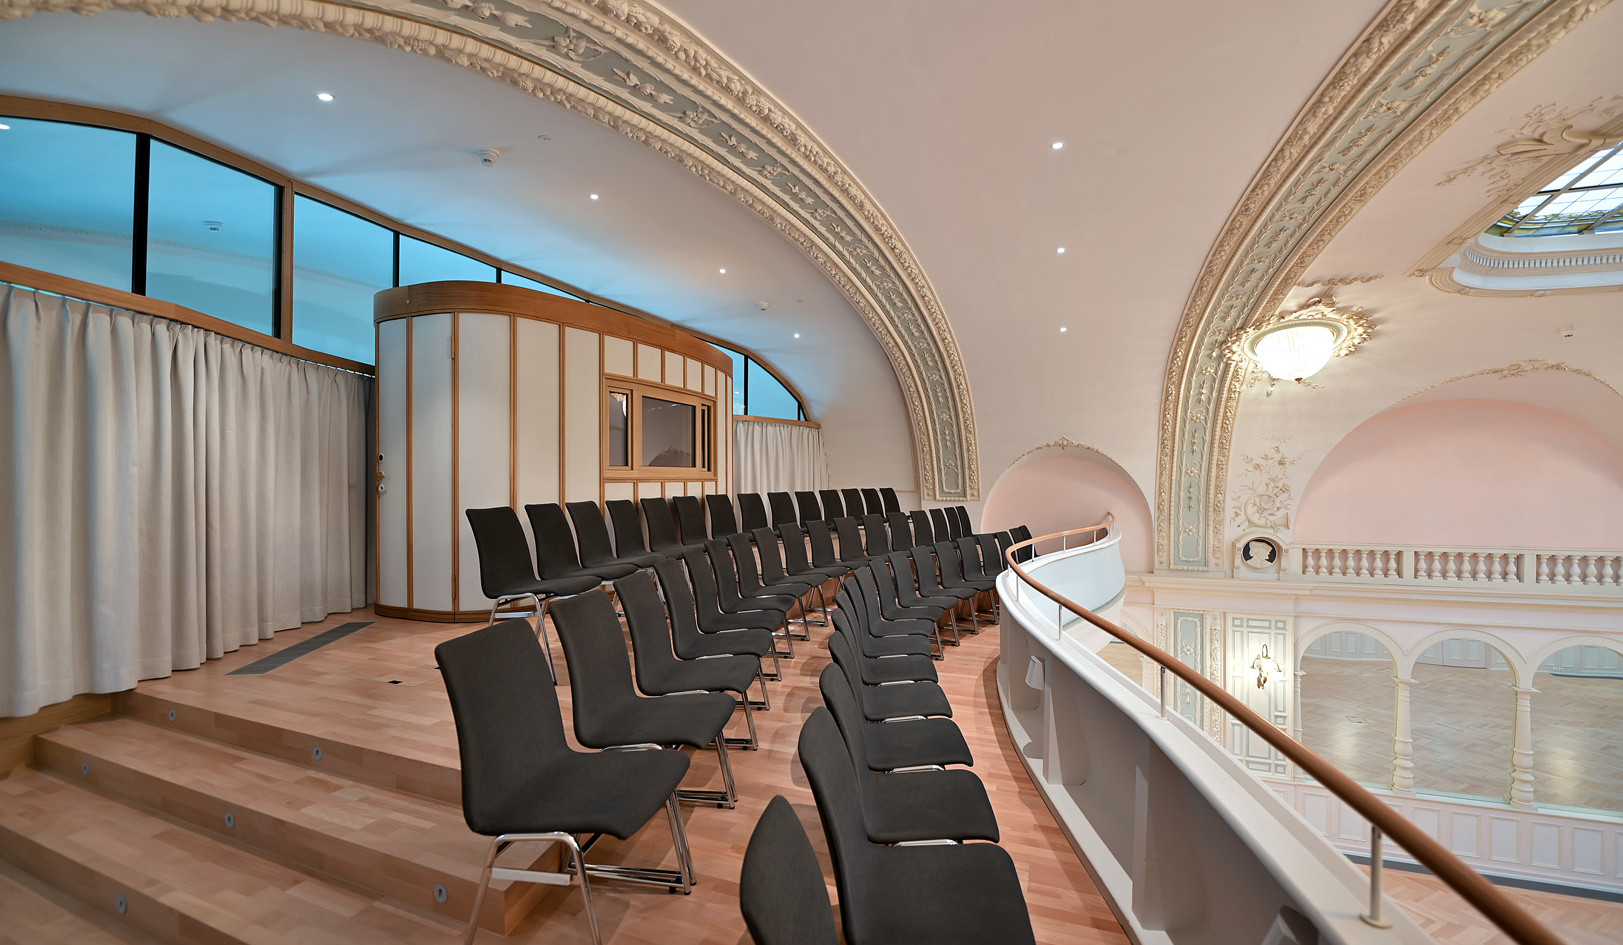 Kursaal Engelberg Technik